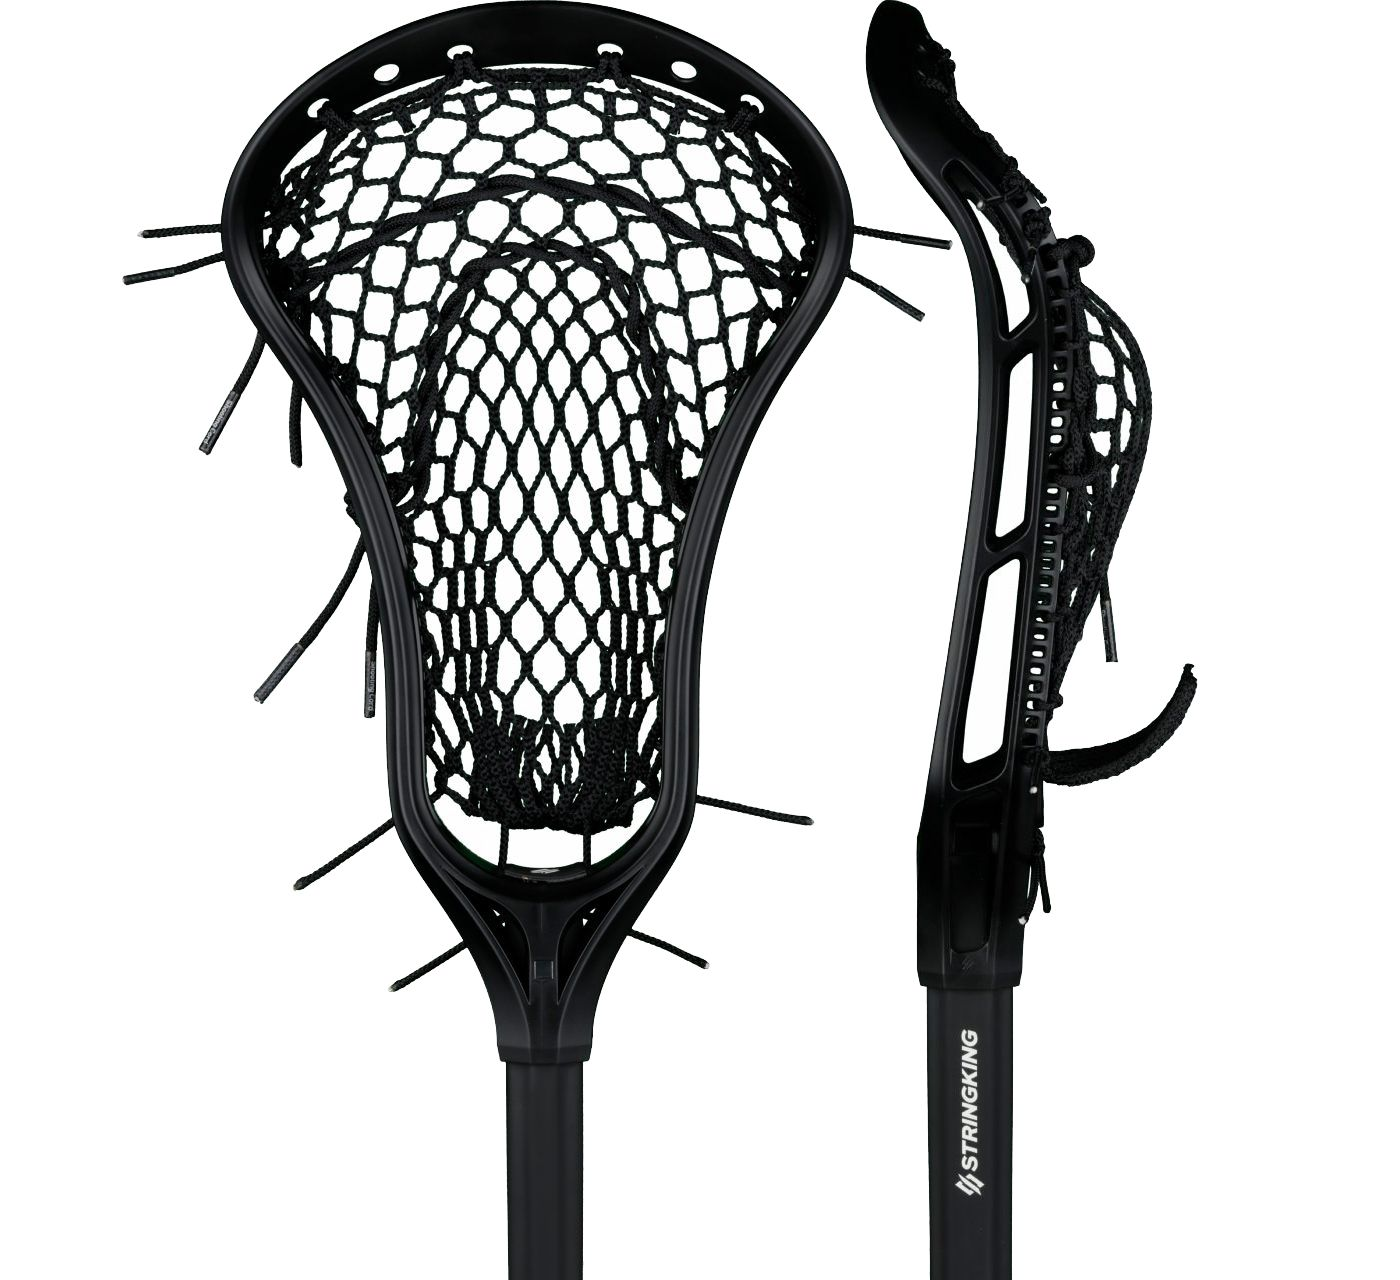 StringKing Women's Complete Junior Lacrosse Stick